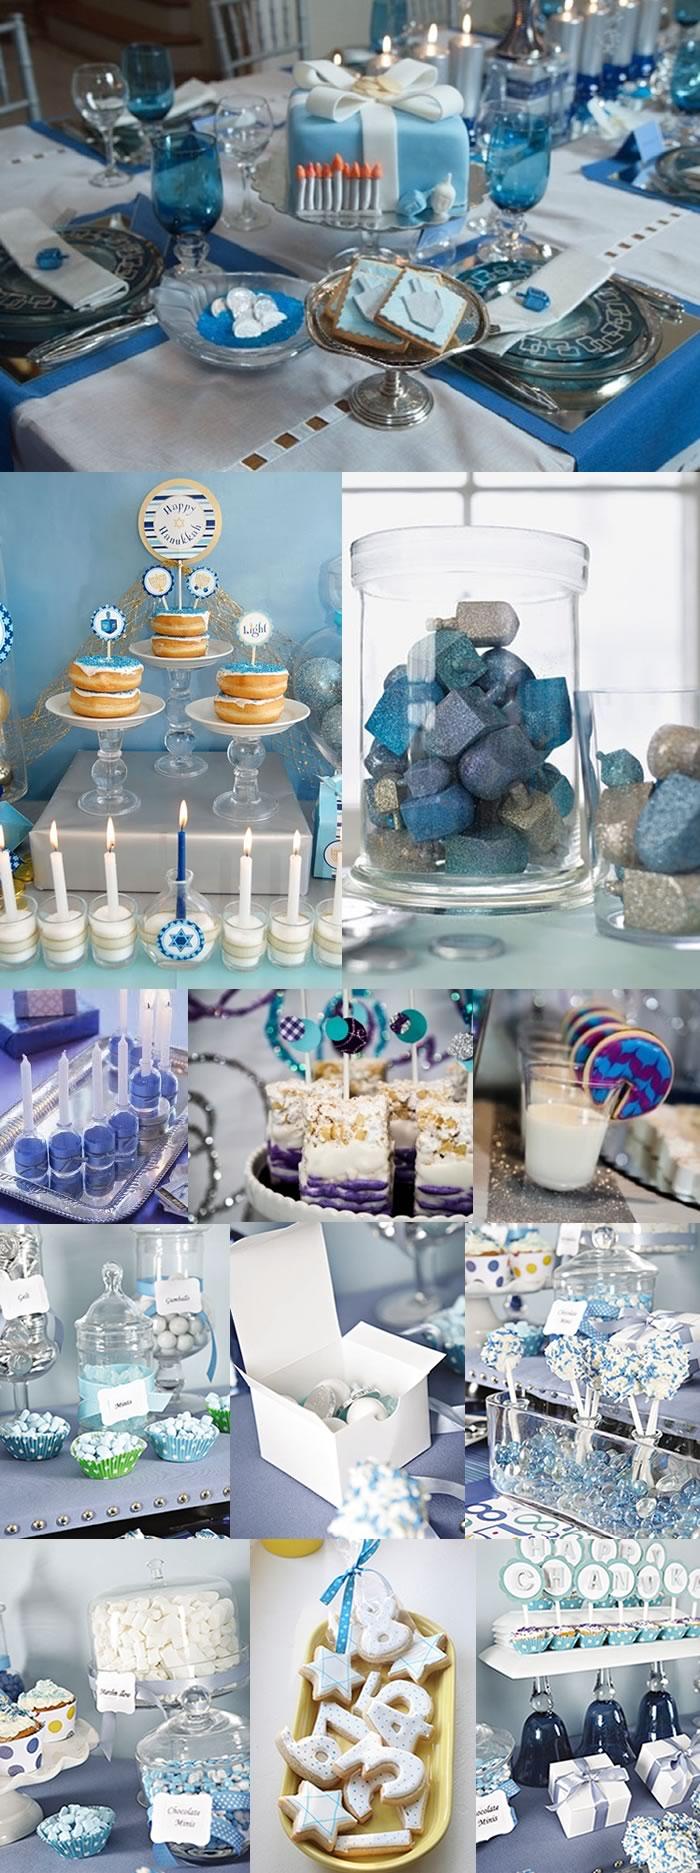 inspiracoes-para-mesa-de-chanukah-hanukkah-inspirations-candies-decor-decorations